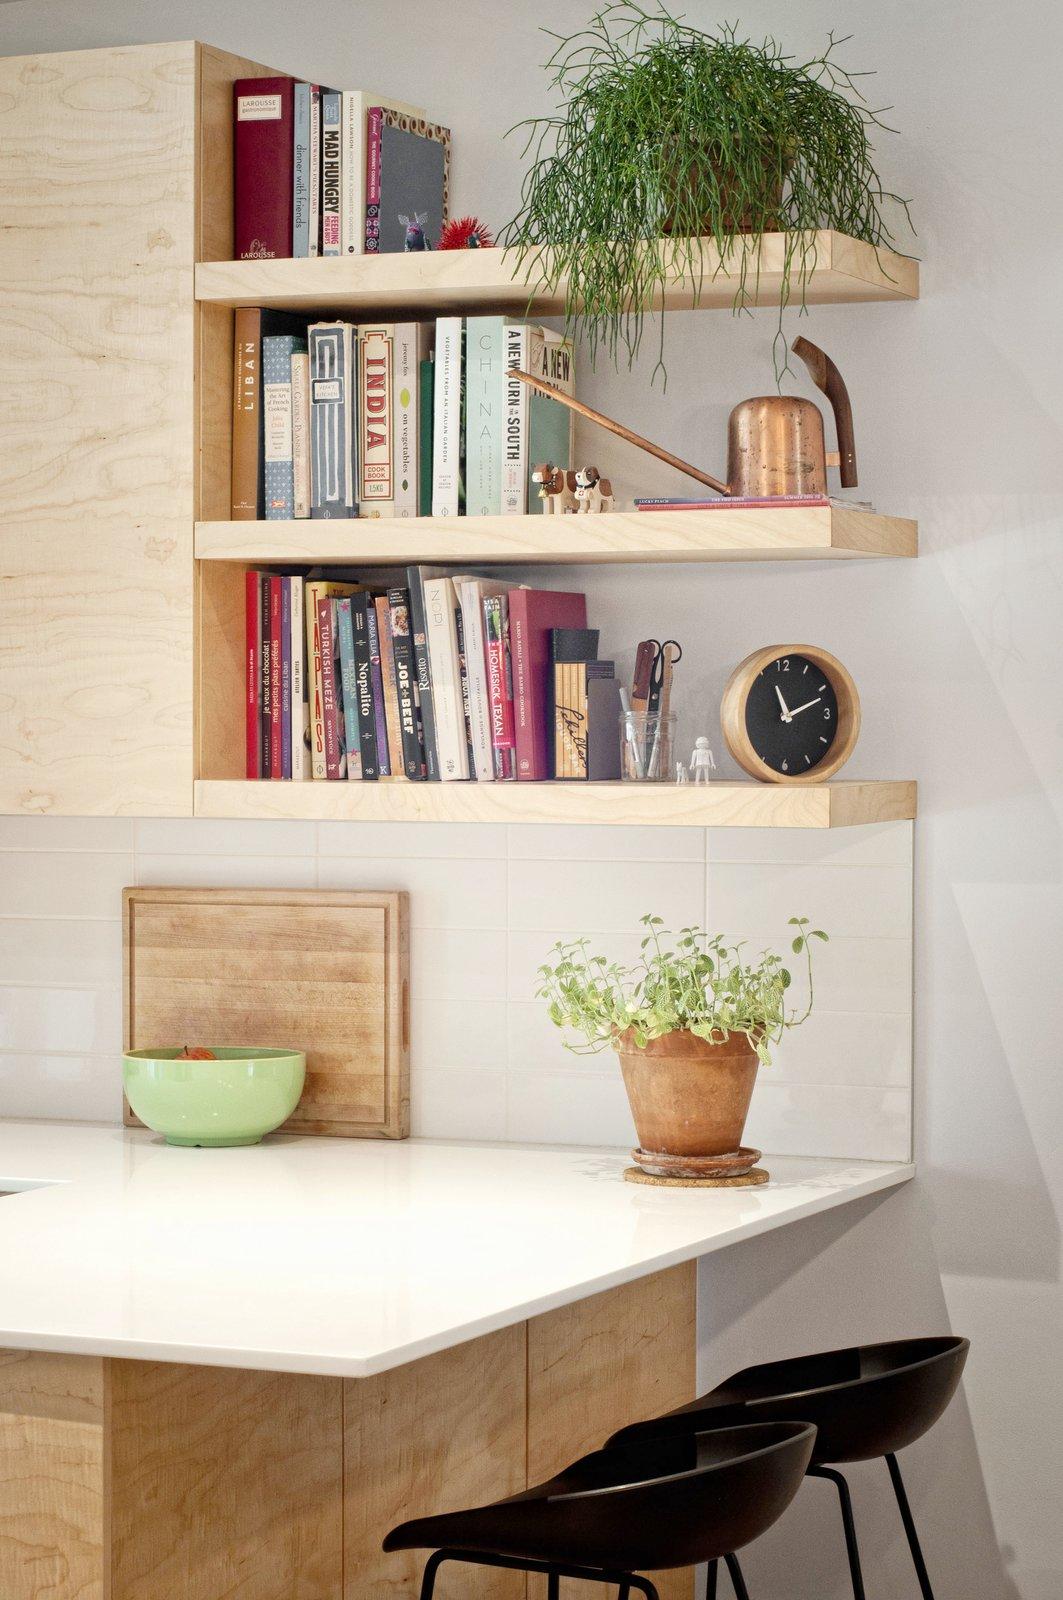 Kitchen, Engineered Quartz Counter, Wood Cabinet, and Ceramic Tile Backsplashe  Fabre Residence